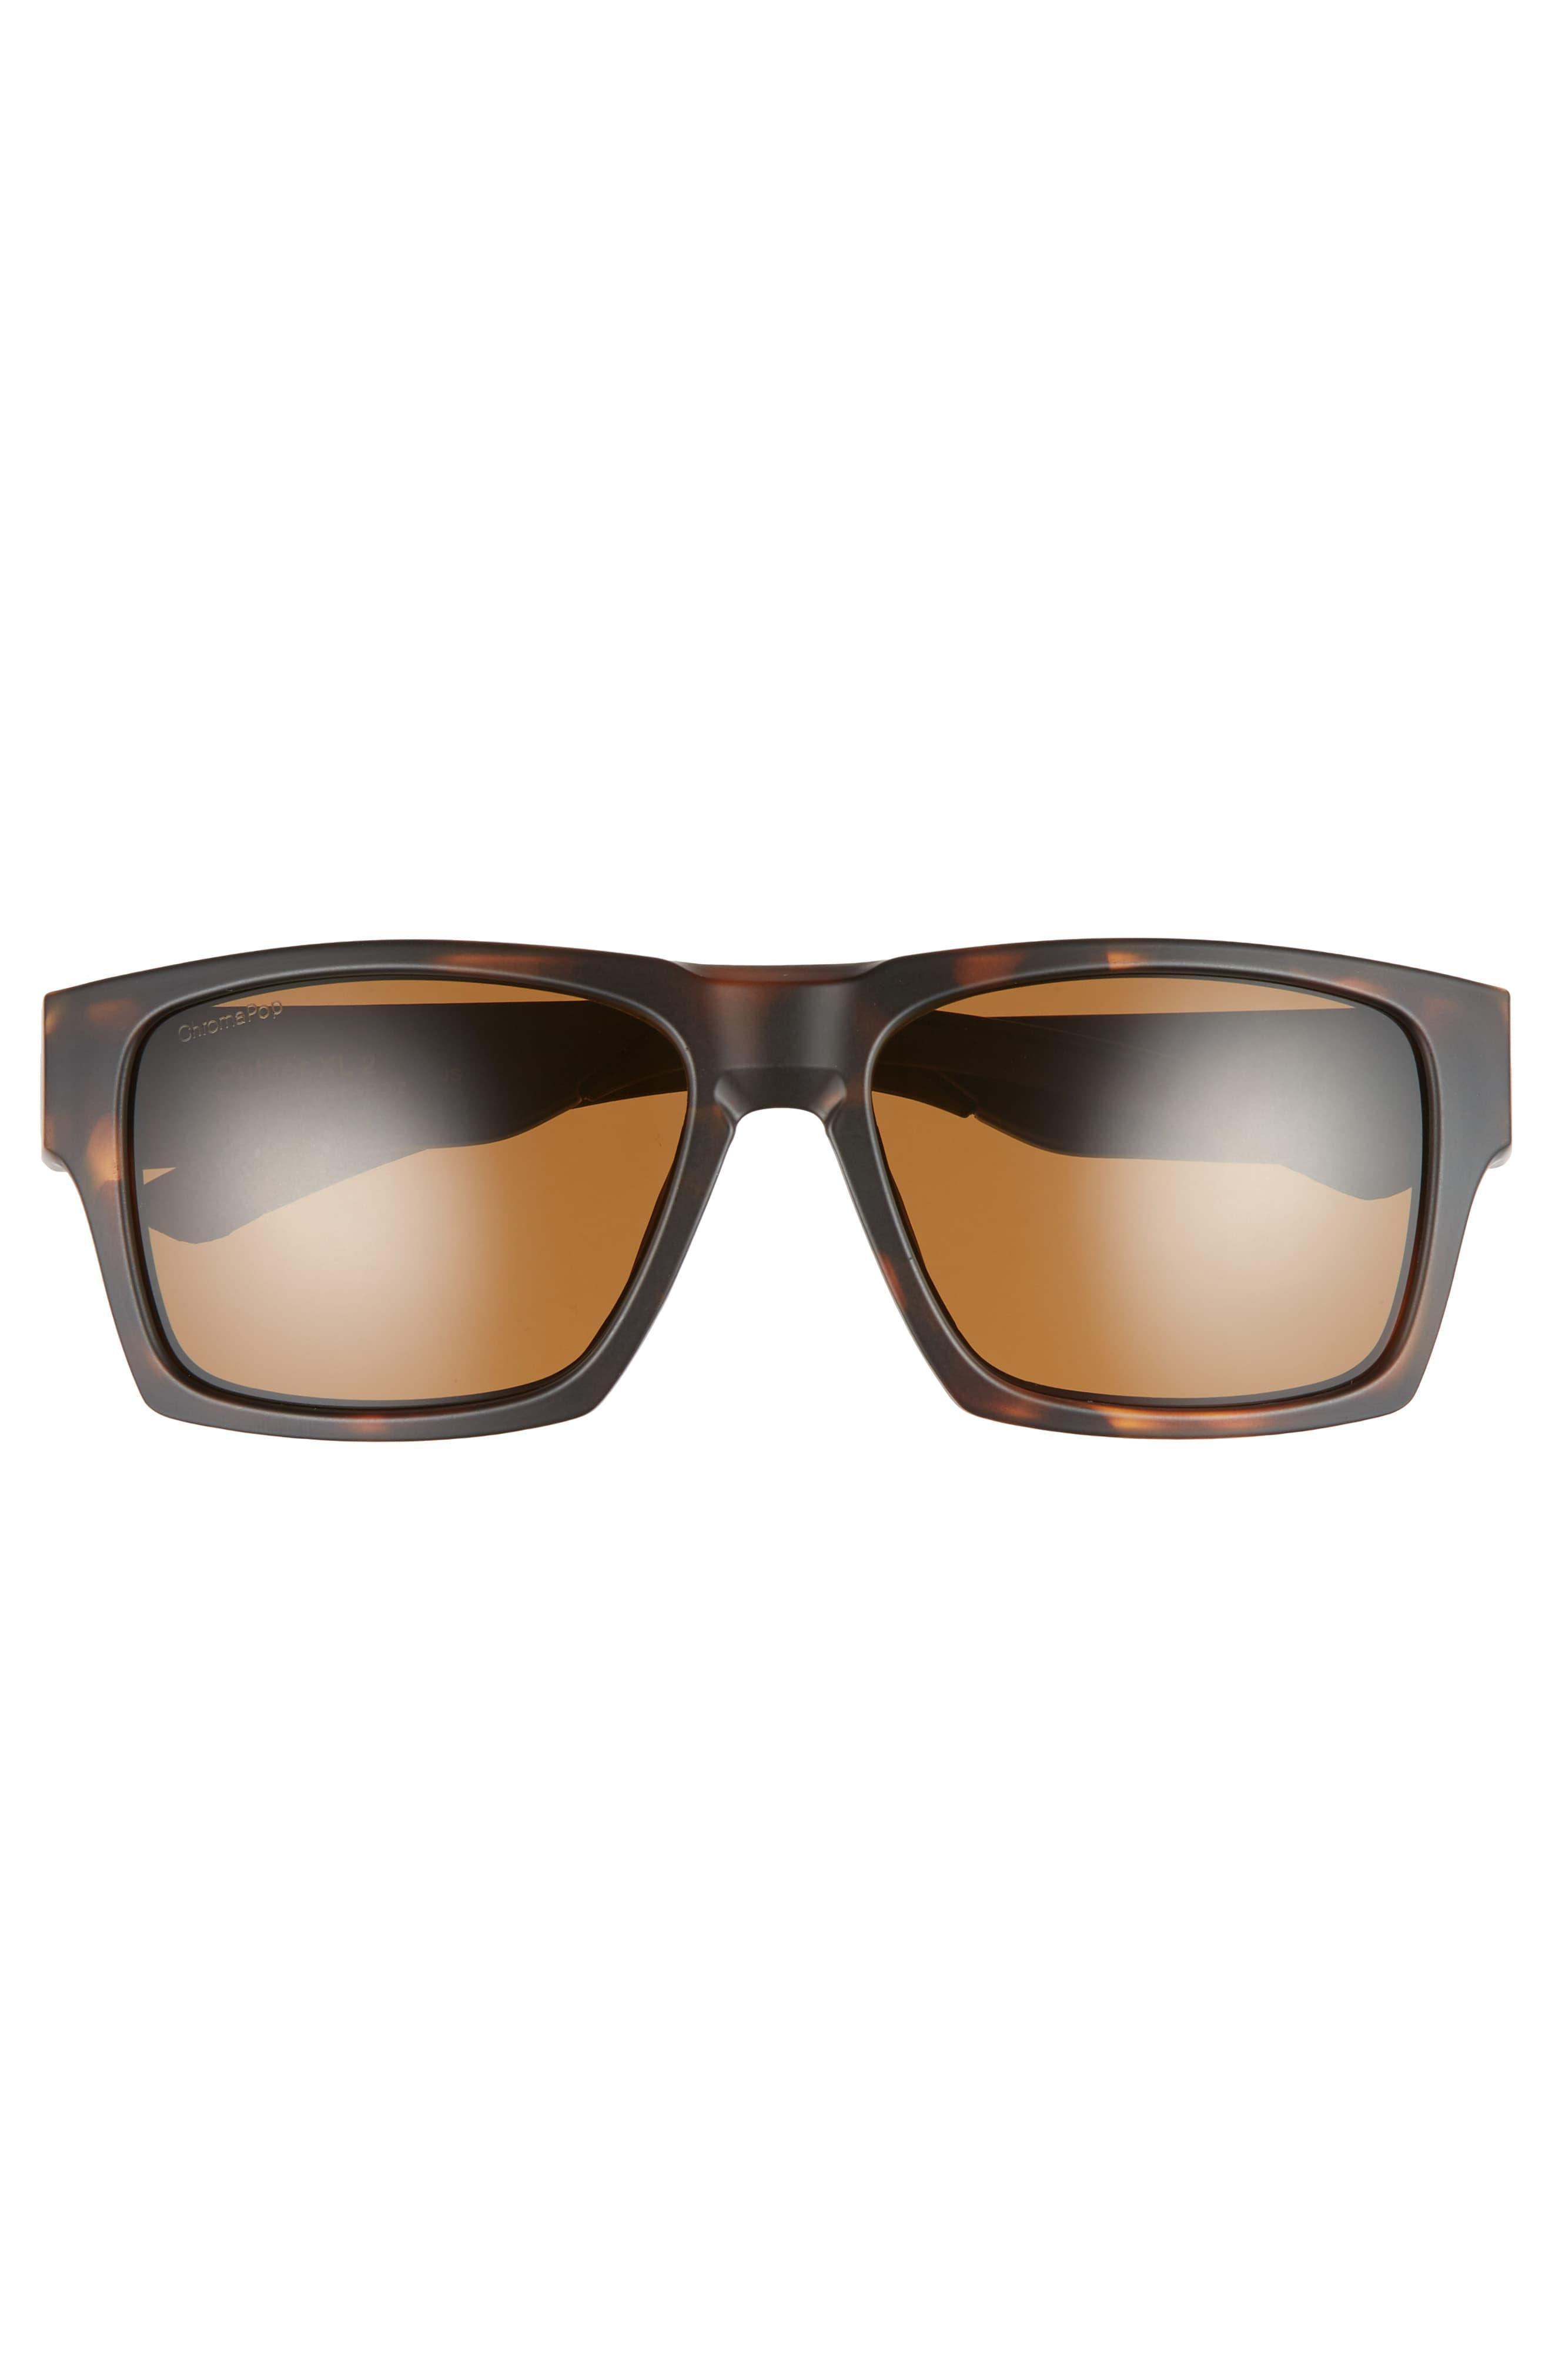 b8ceade2d1 Smith - Brown Outlier 2 Xl 59mm Chromapoptm Polarized Sunglasses for Men -  Lyst. View fullscreen